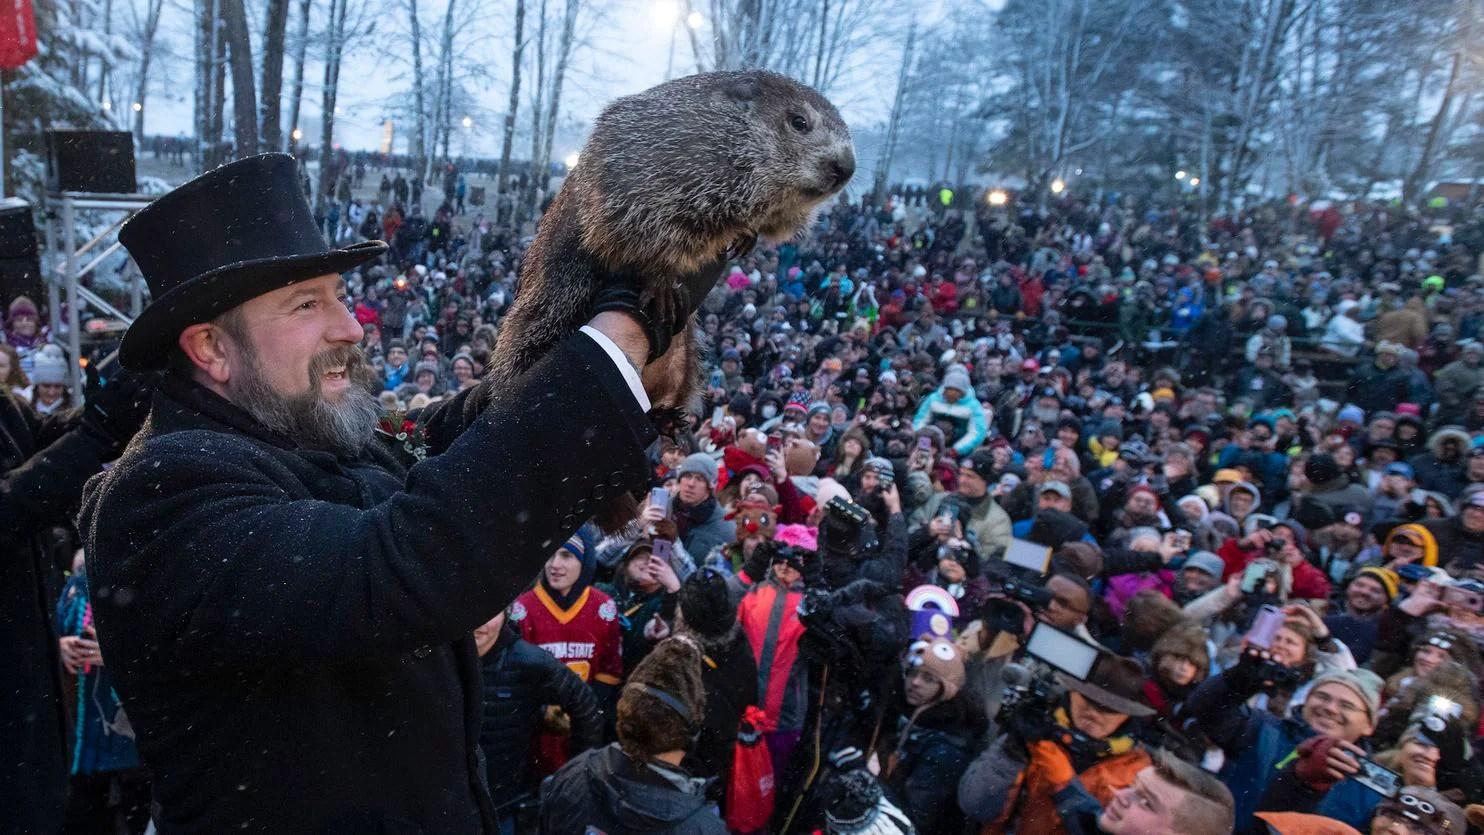 Groundhog Day Punxsutawney Phil Predicts Early